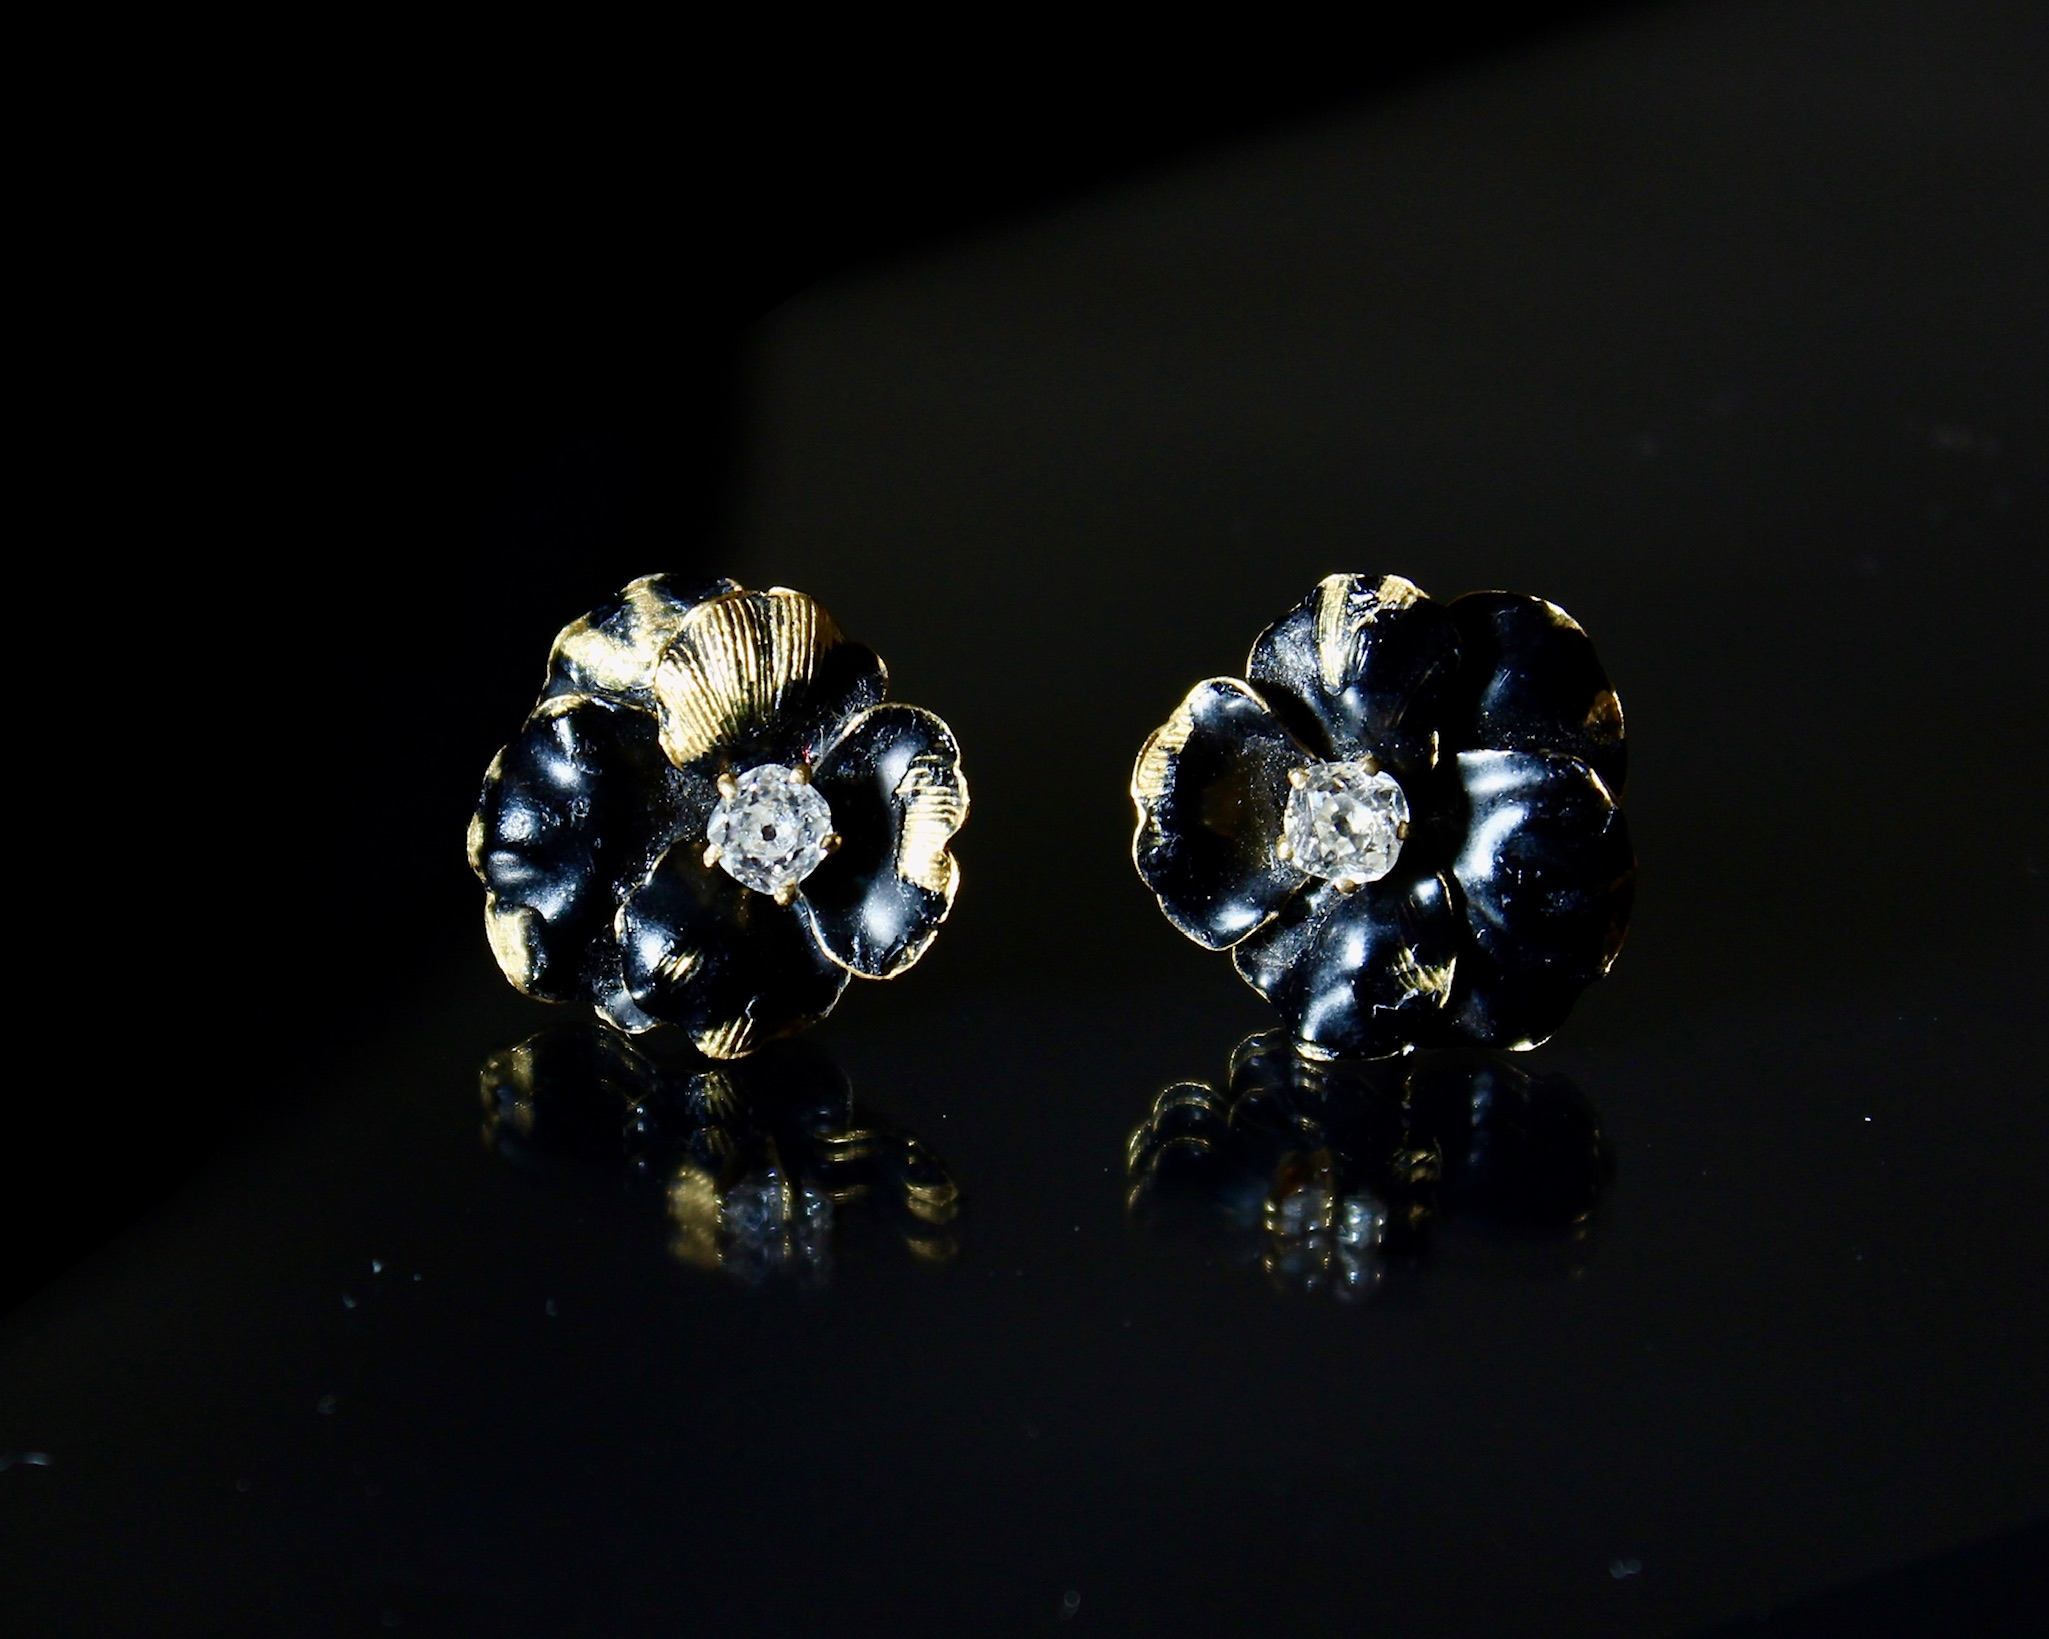 Lot 28 - Black Enamel and Diamond Stud Earrings, Tiffany & Co.